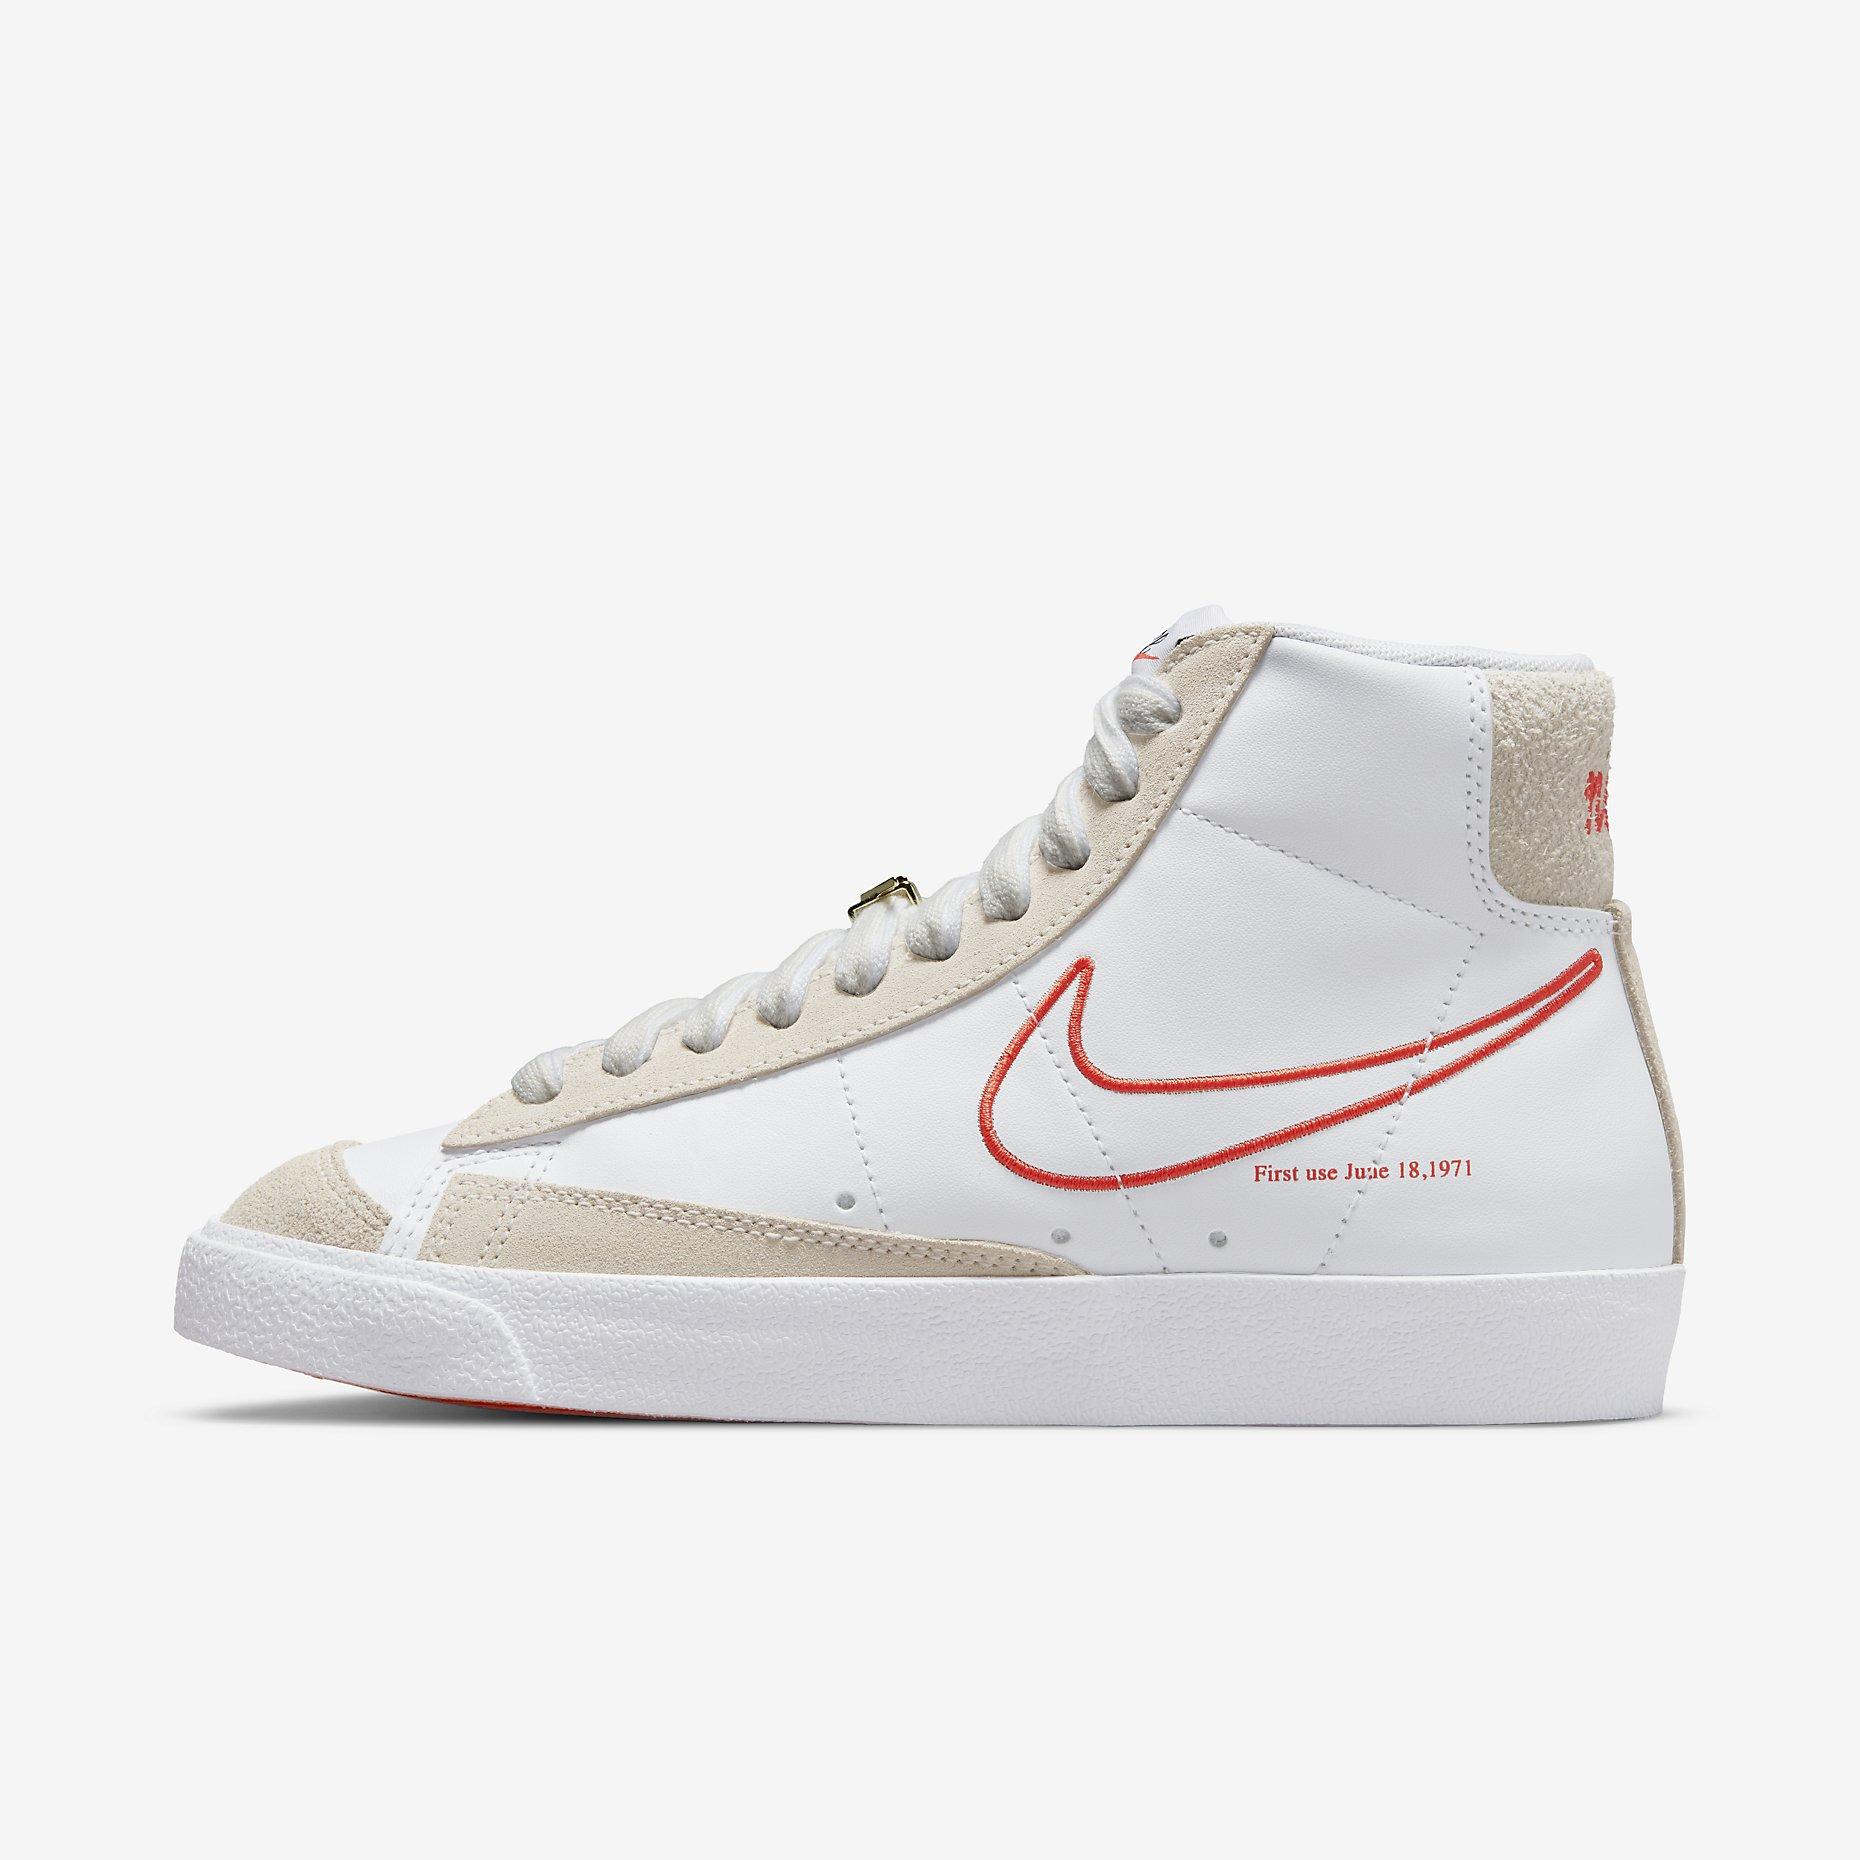 Women's Nike Blazer Mid '77 SE 'Summit White' - First Use